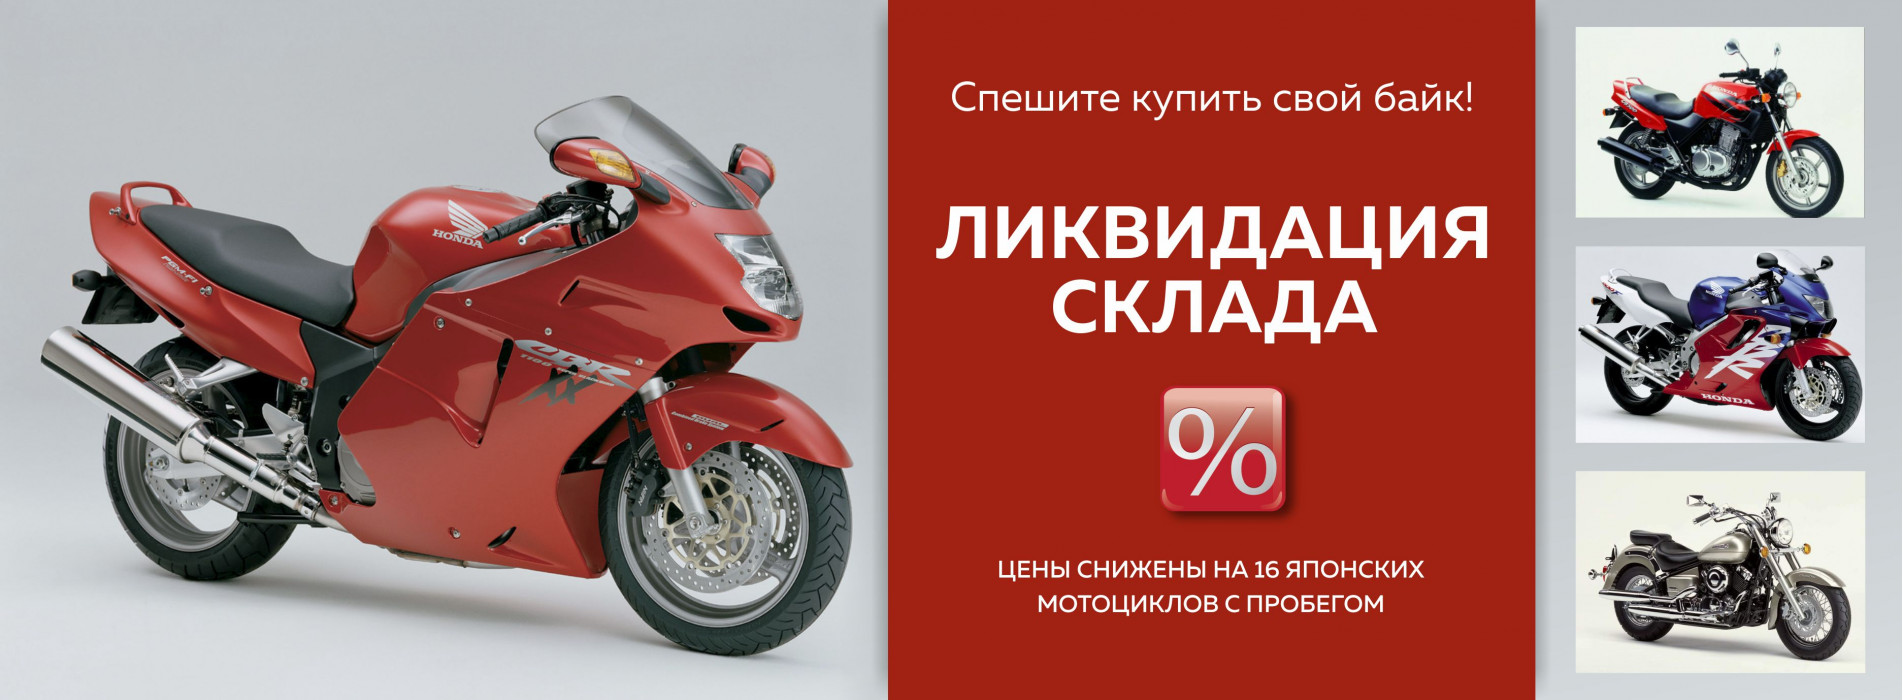 Сезон скидок на мотоциклы с пробегом!